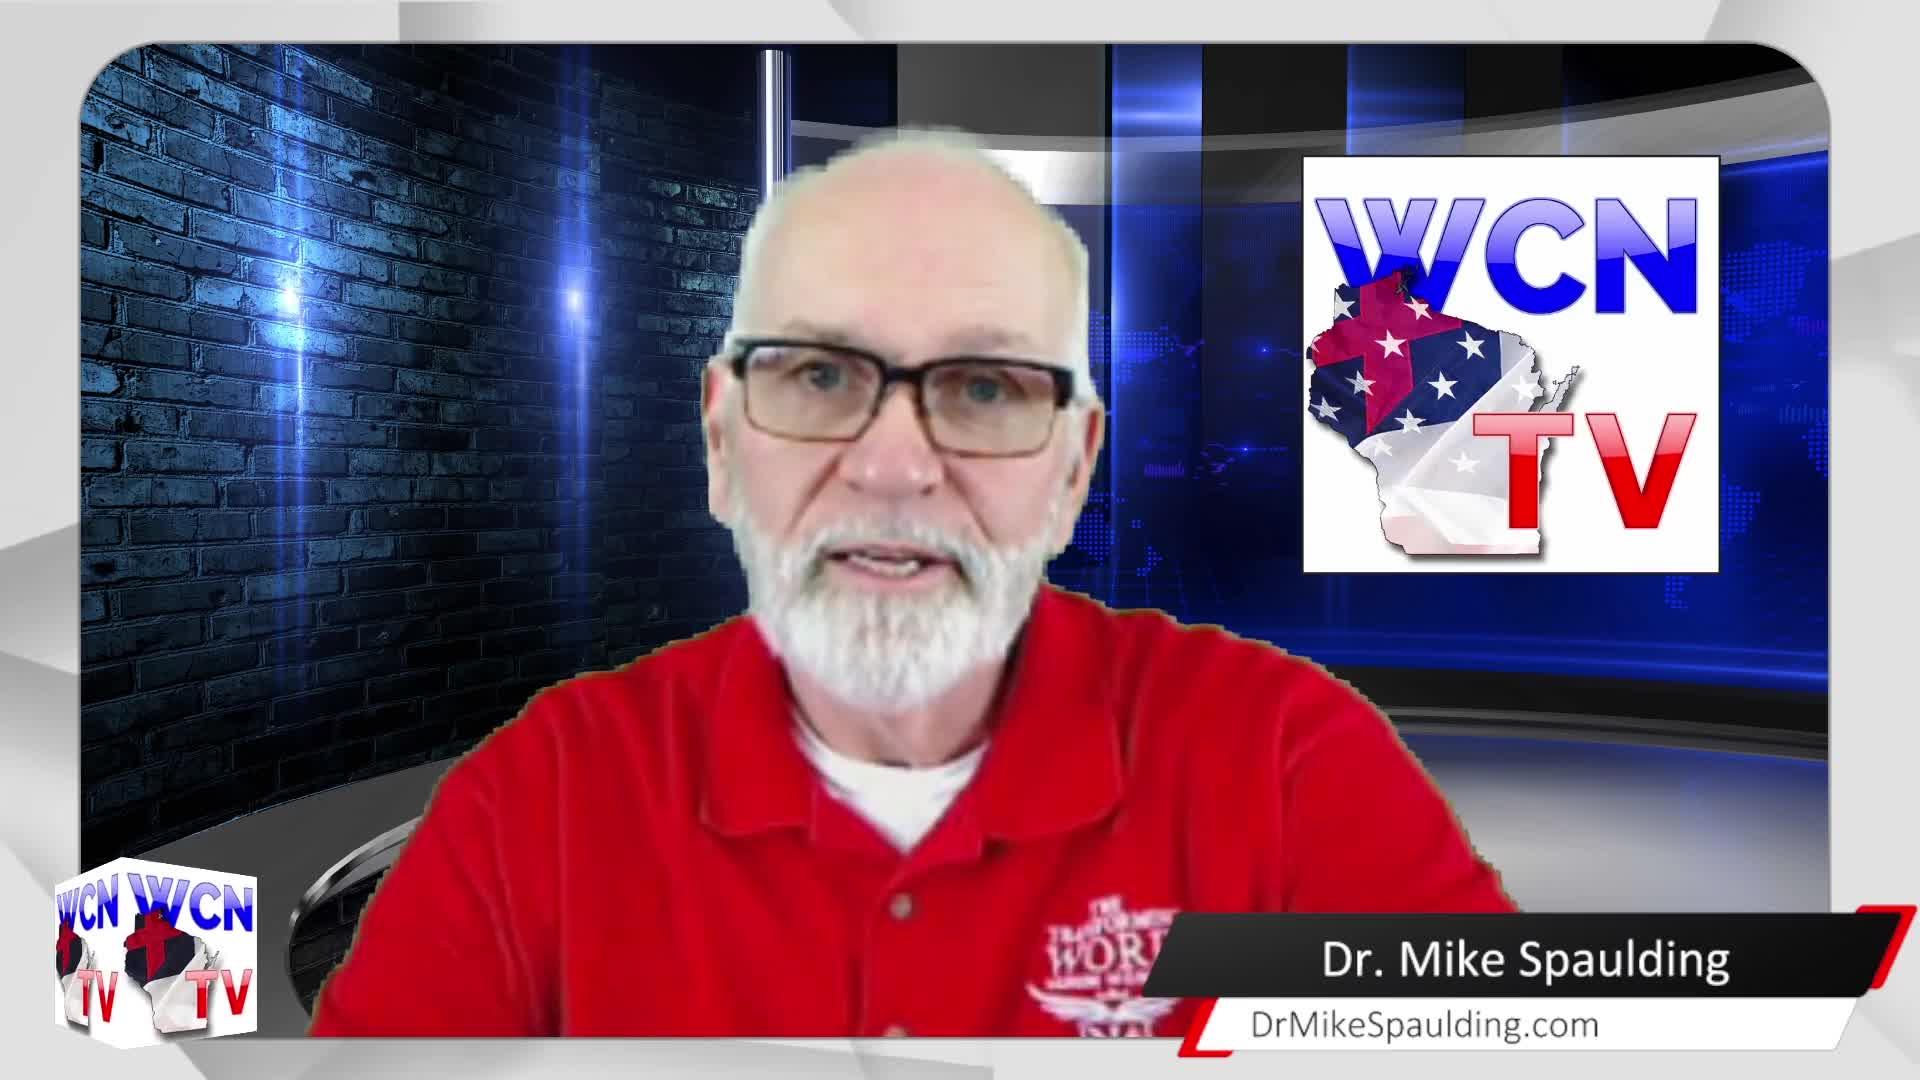 WCN-TV | September 8th, 2021 | Dr. Mike Spaulding